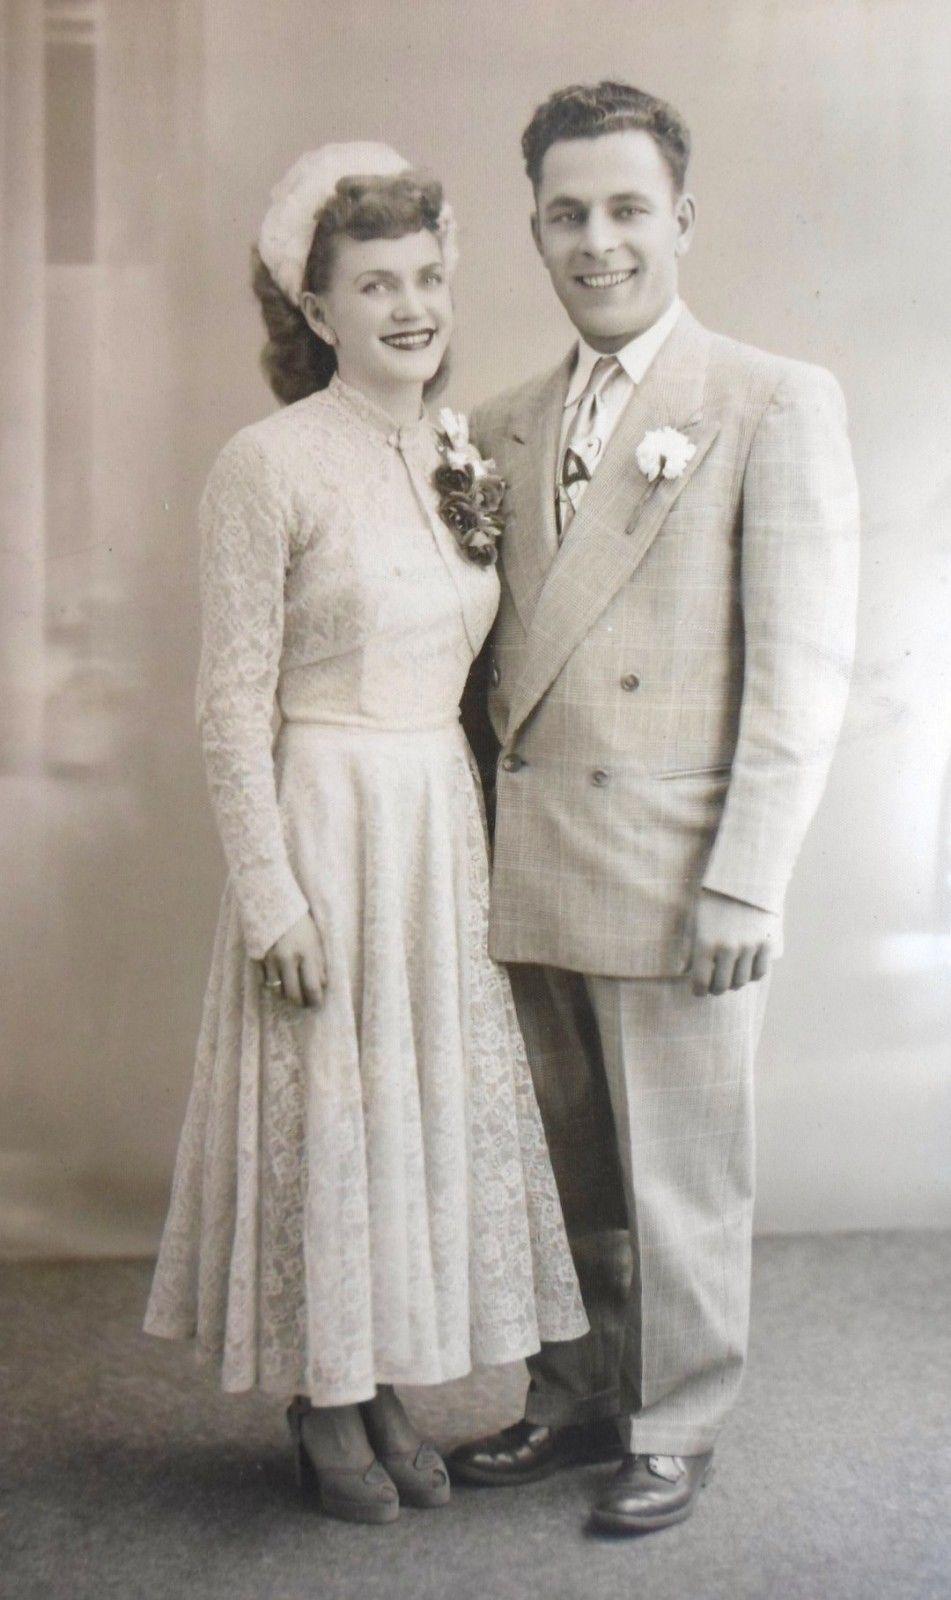 Vintage 1940\'s Wedding Portrait Bride Groom Lace Dress with Matador ...